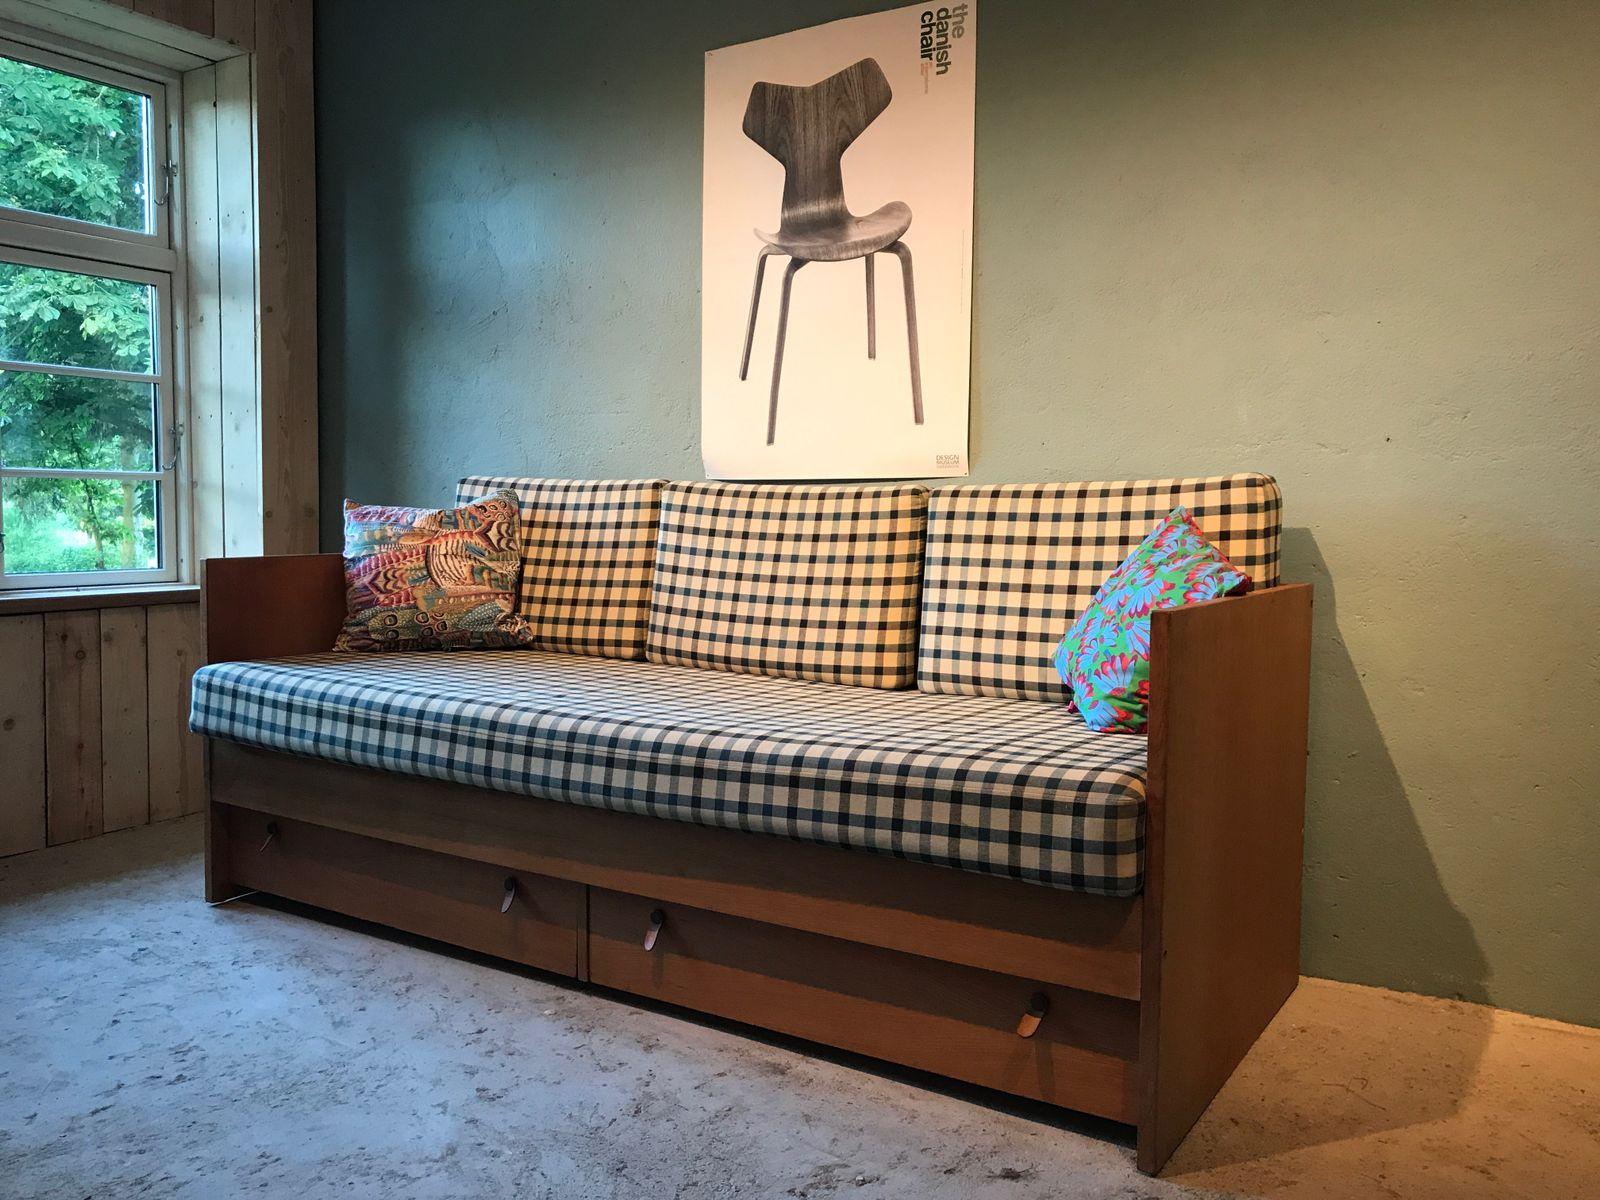 Vintage Danish Sofa Bed by B¸rge Mogensen for S¸borg M¸belfabrik